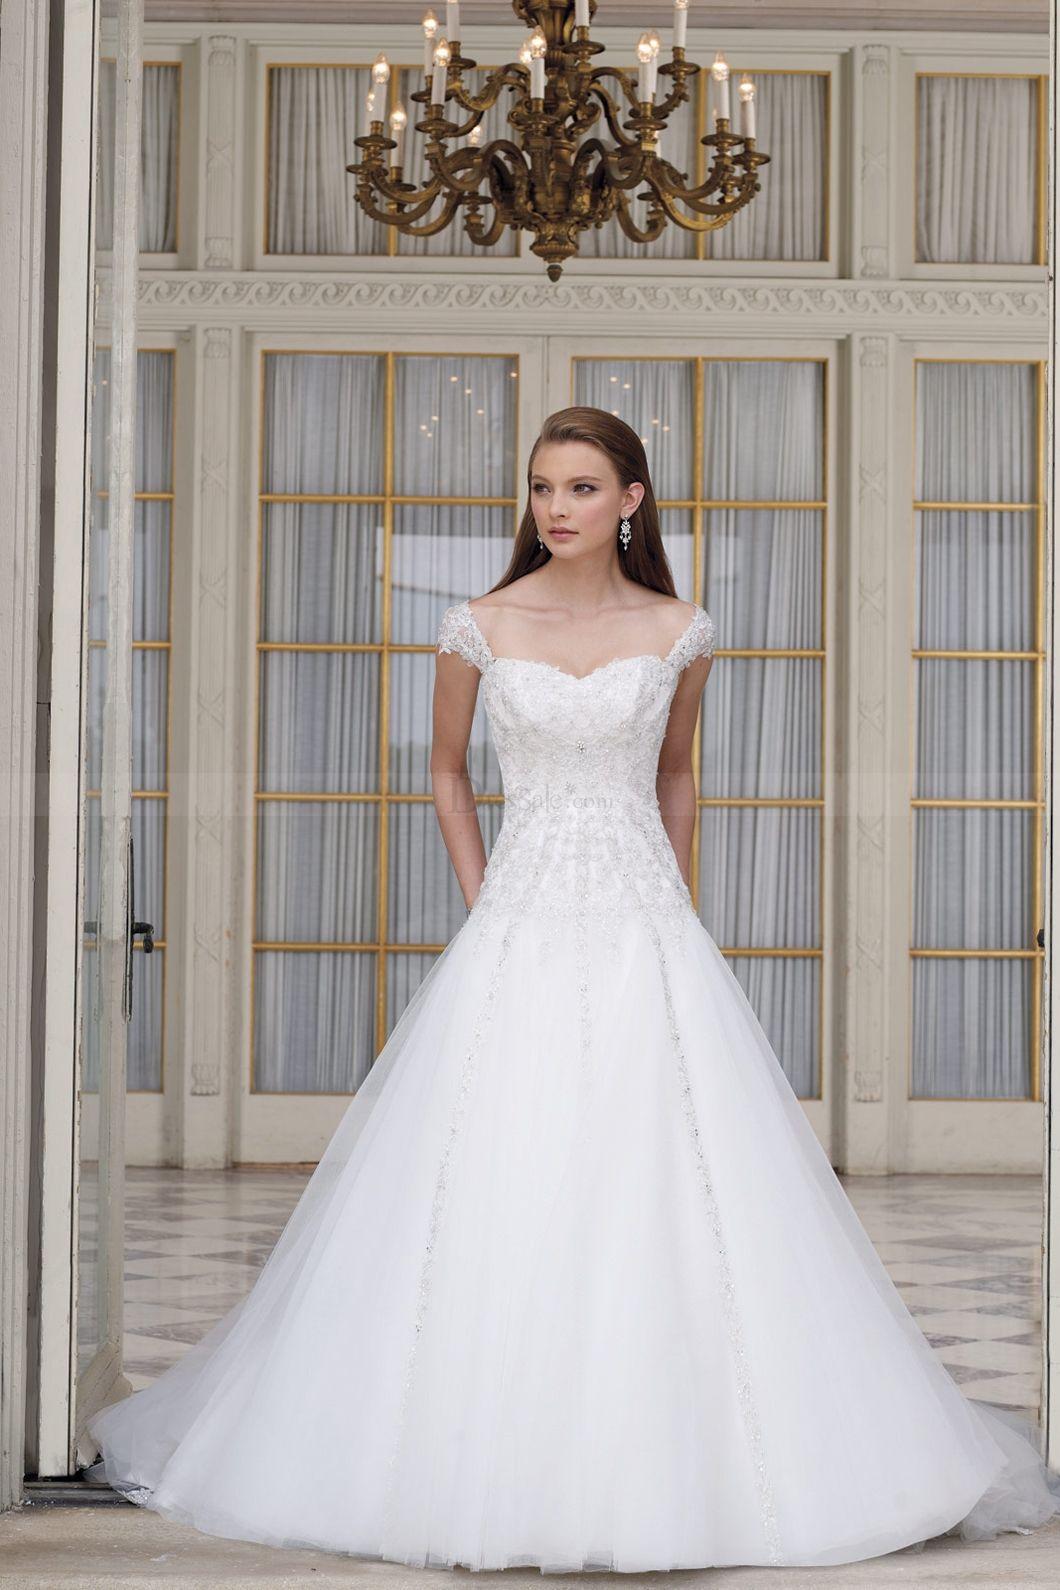 Lace Wedding Dresses Under 100 Dollars - http://ideasforwedding.co ...